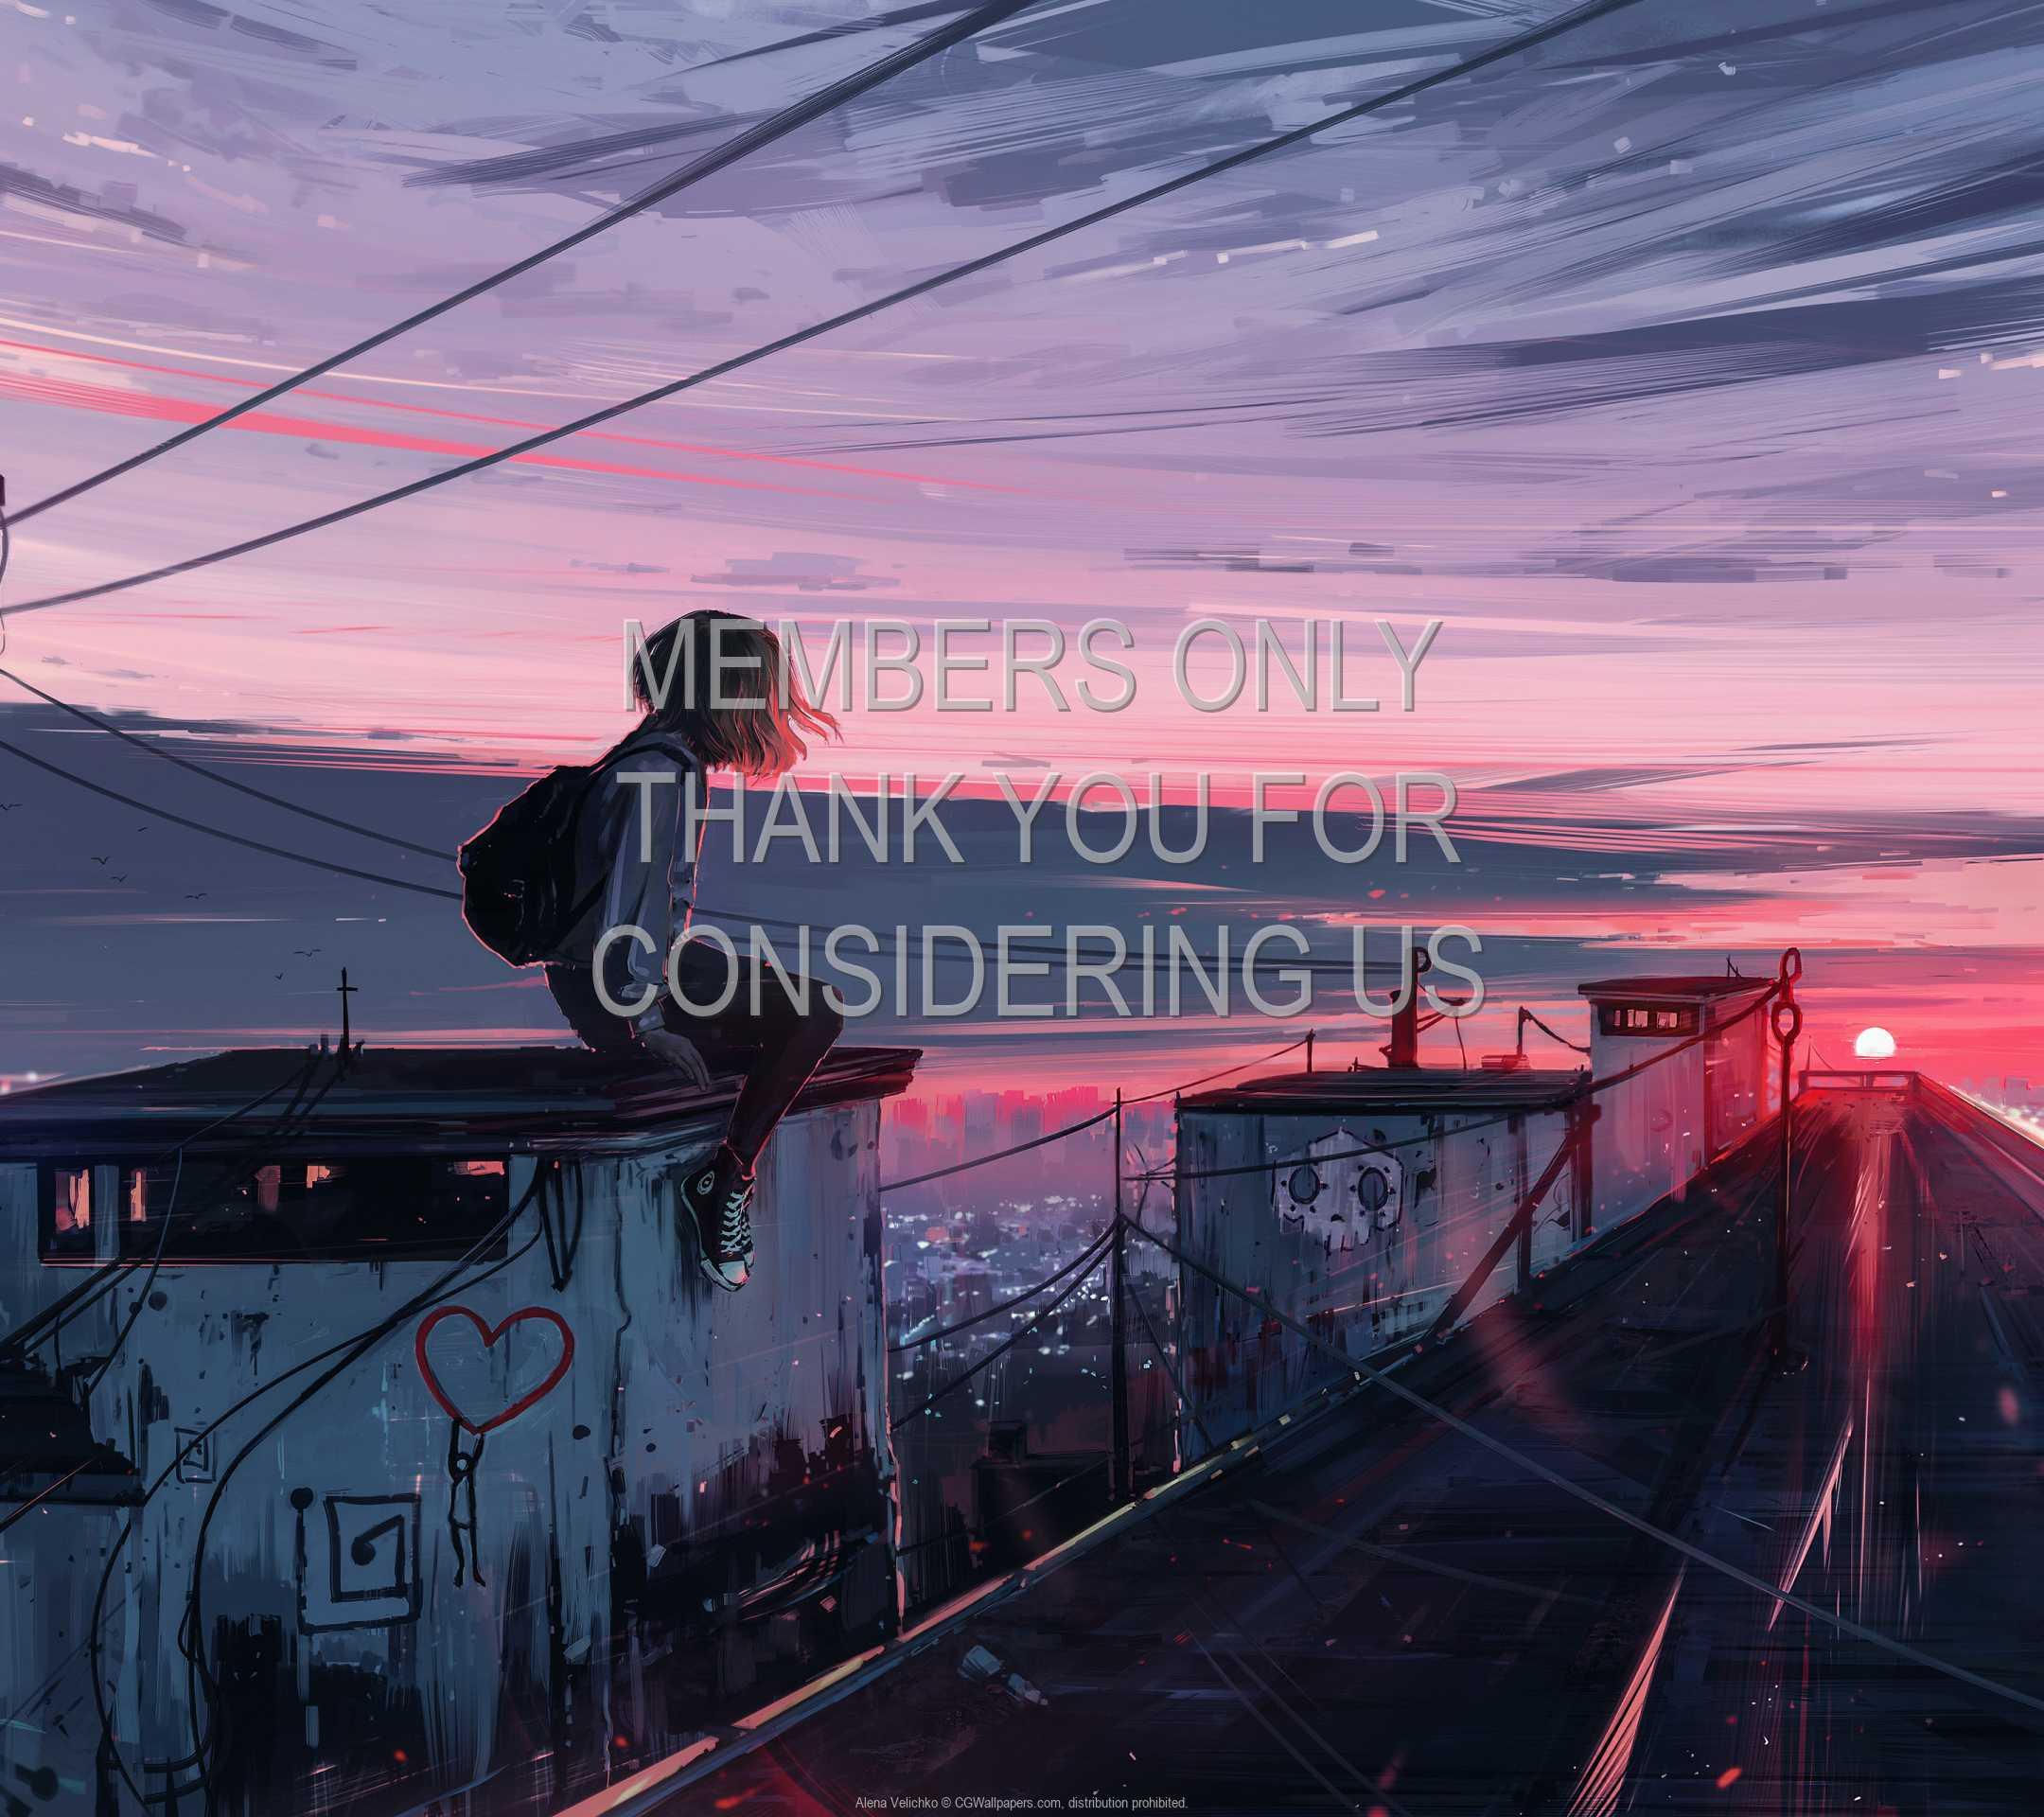 Alena Velichko 1080p Horizontal Mobile wallpaper or background 12